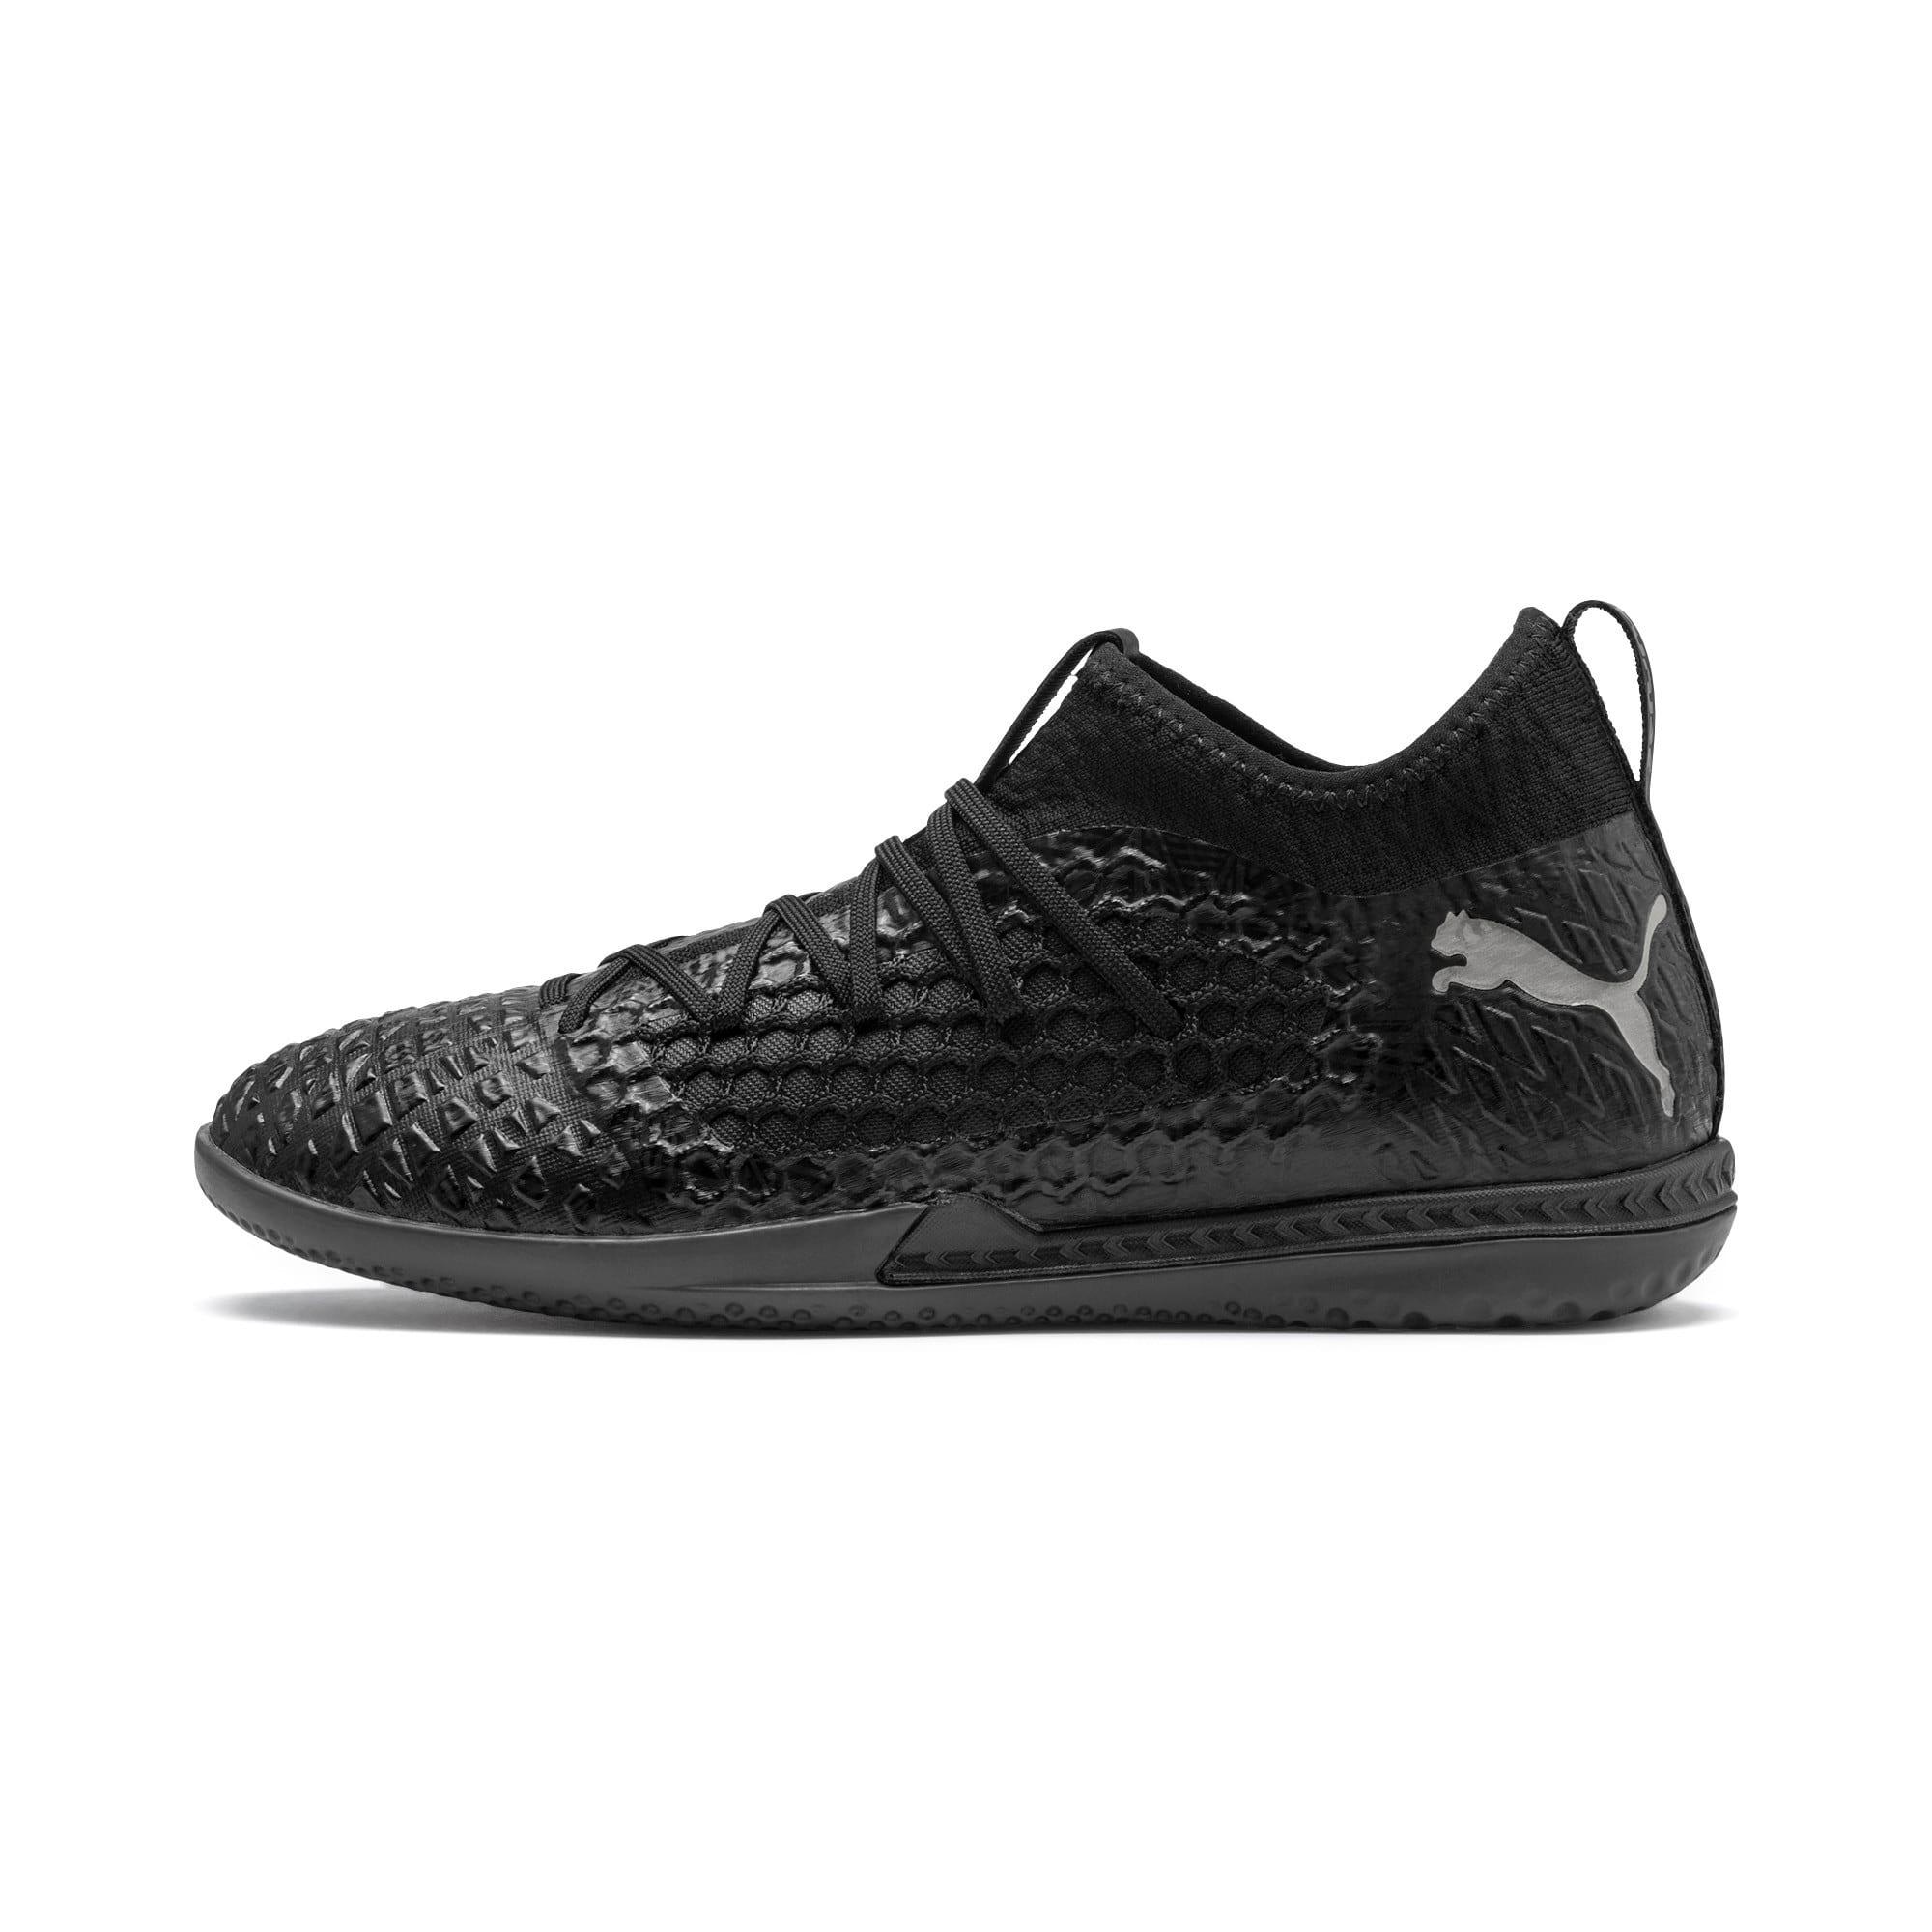 Thumbnail 1 of FUTURE 4.3 NETFIT IT Men's Soccer Shoes, Black-Black-Puma Aged Silver, medium